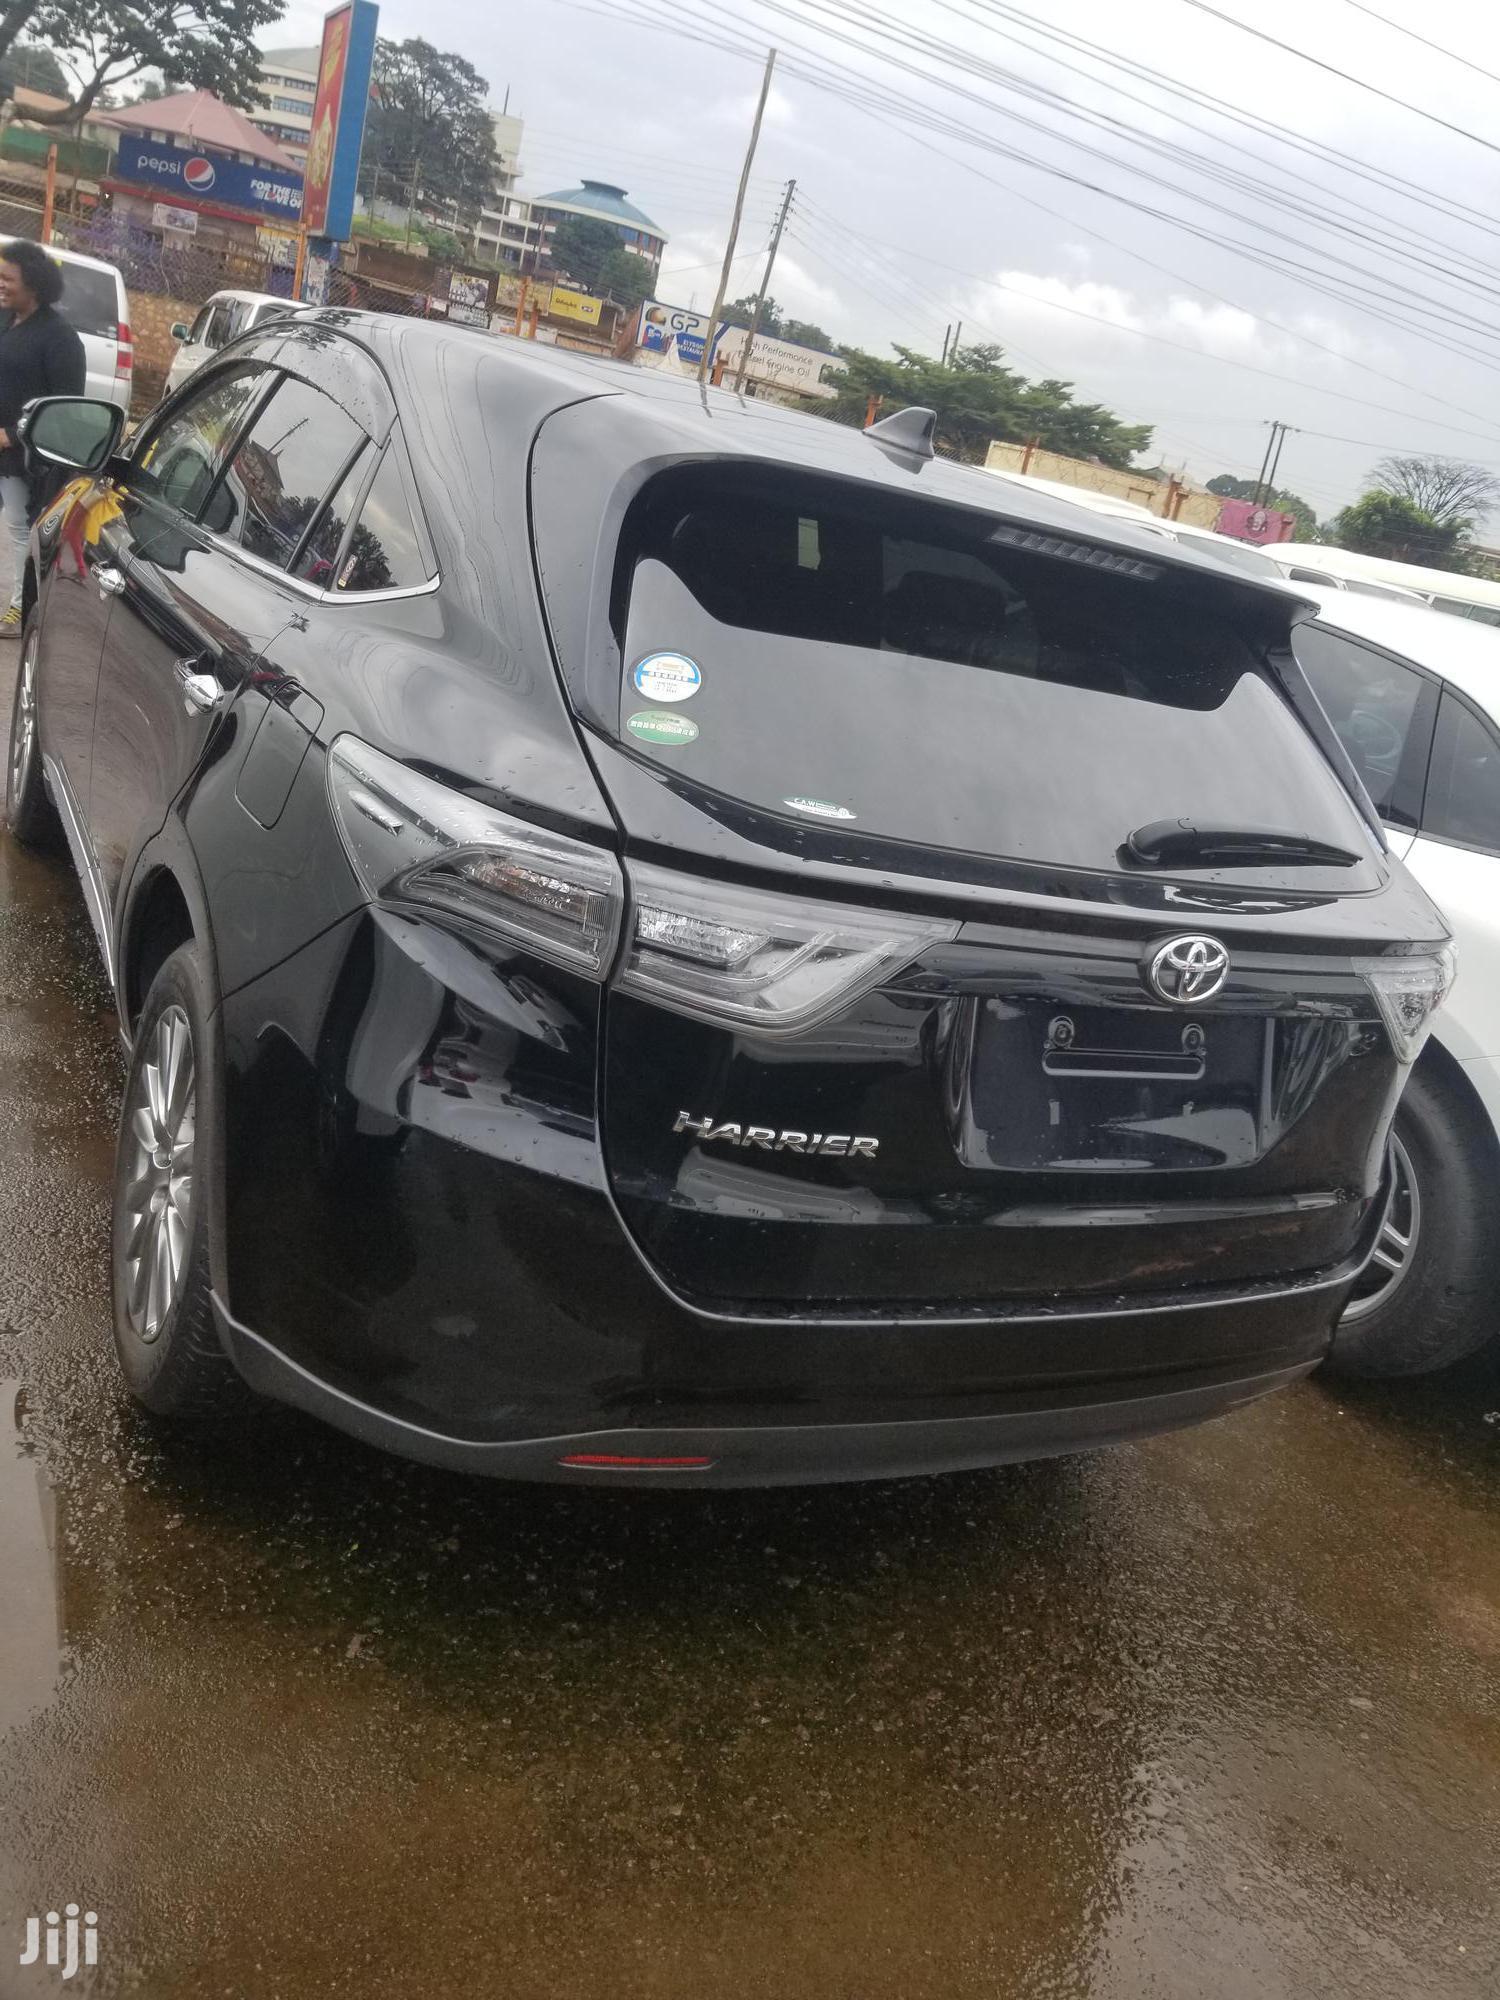 Toyota Harrier 2016 Black | Cars for sale in Kampala, Central Region, Uganda